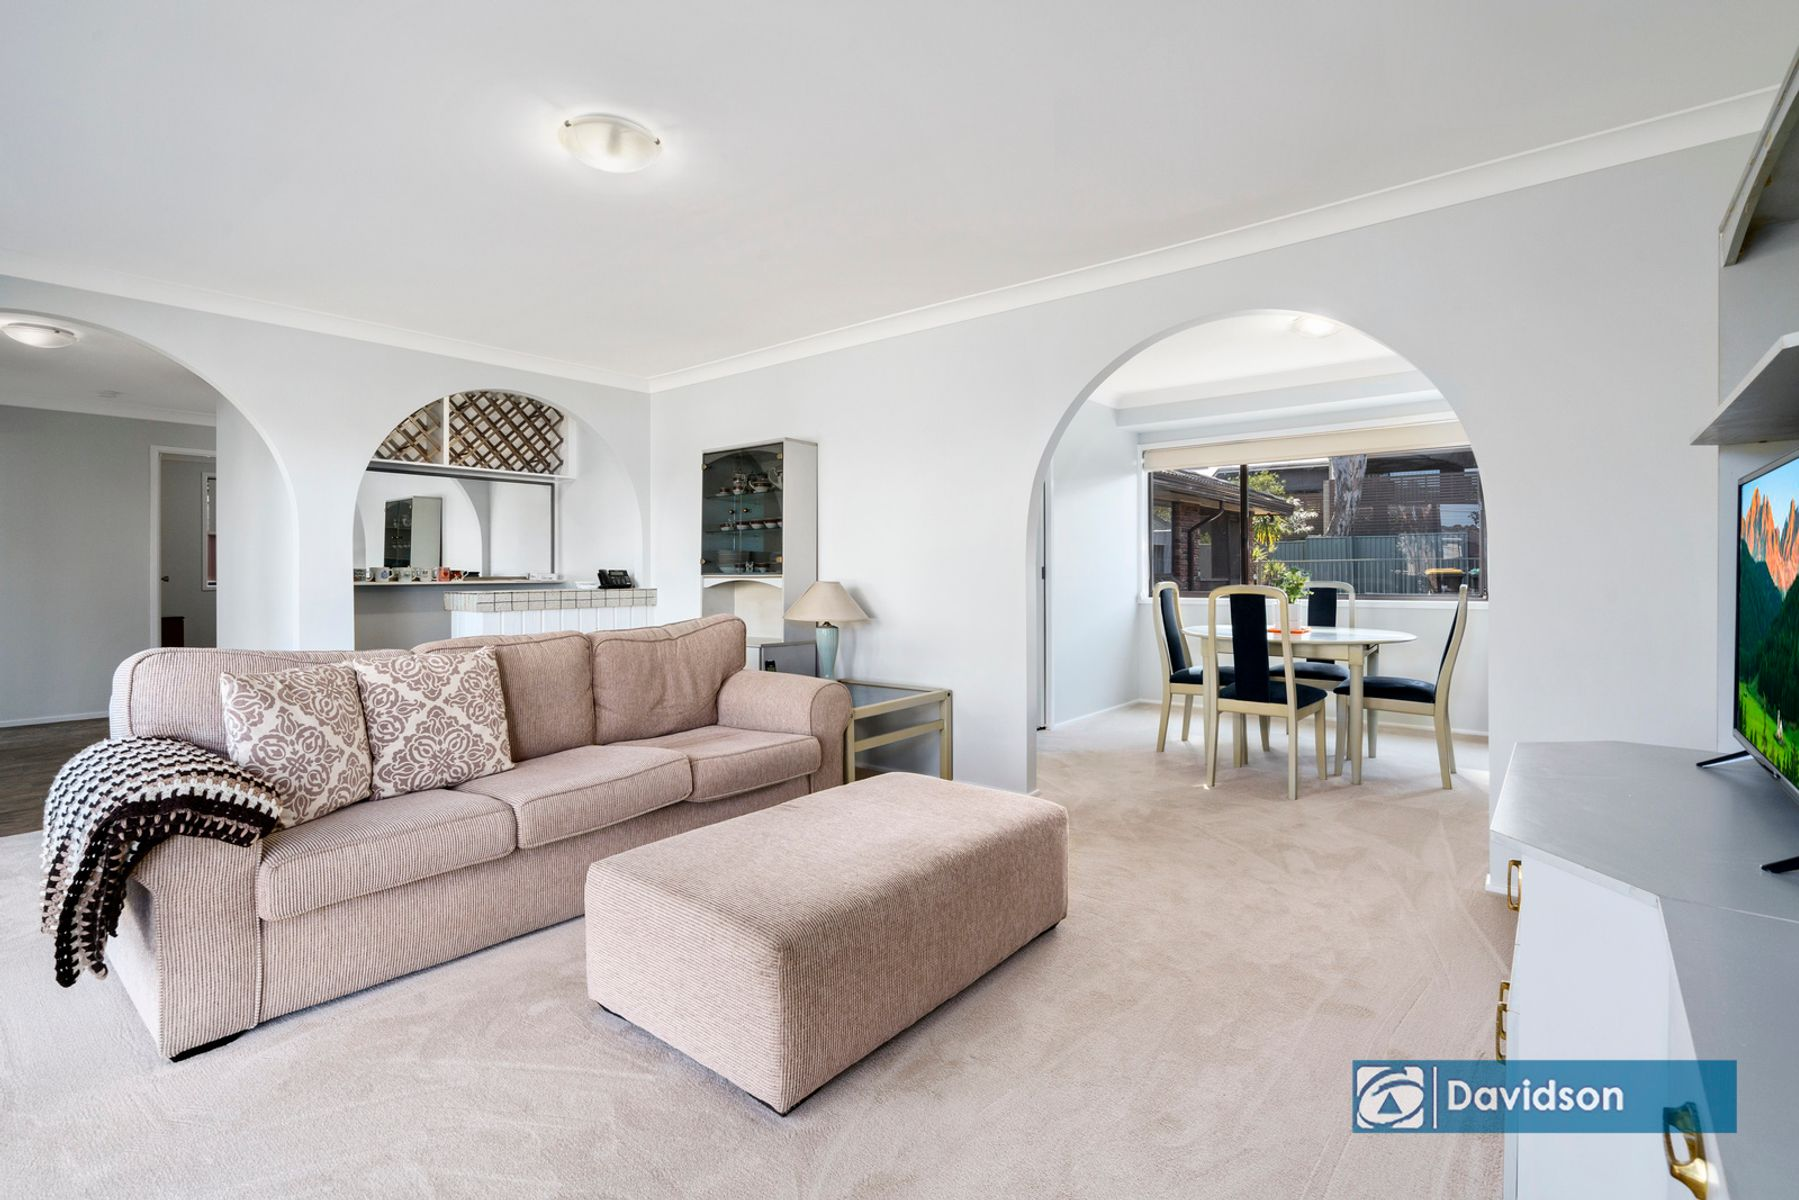 26 Morley Avenue, Hammondville, NSW 2170